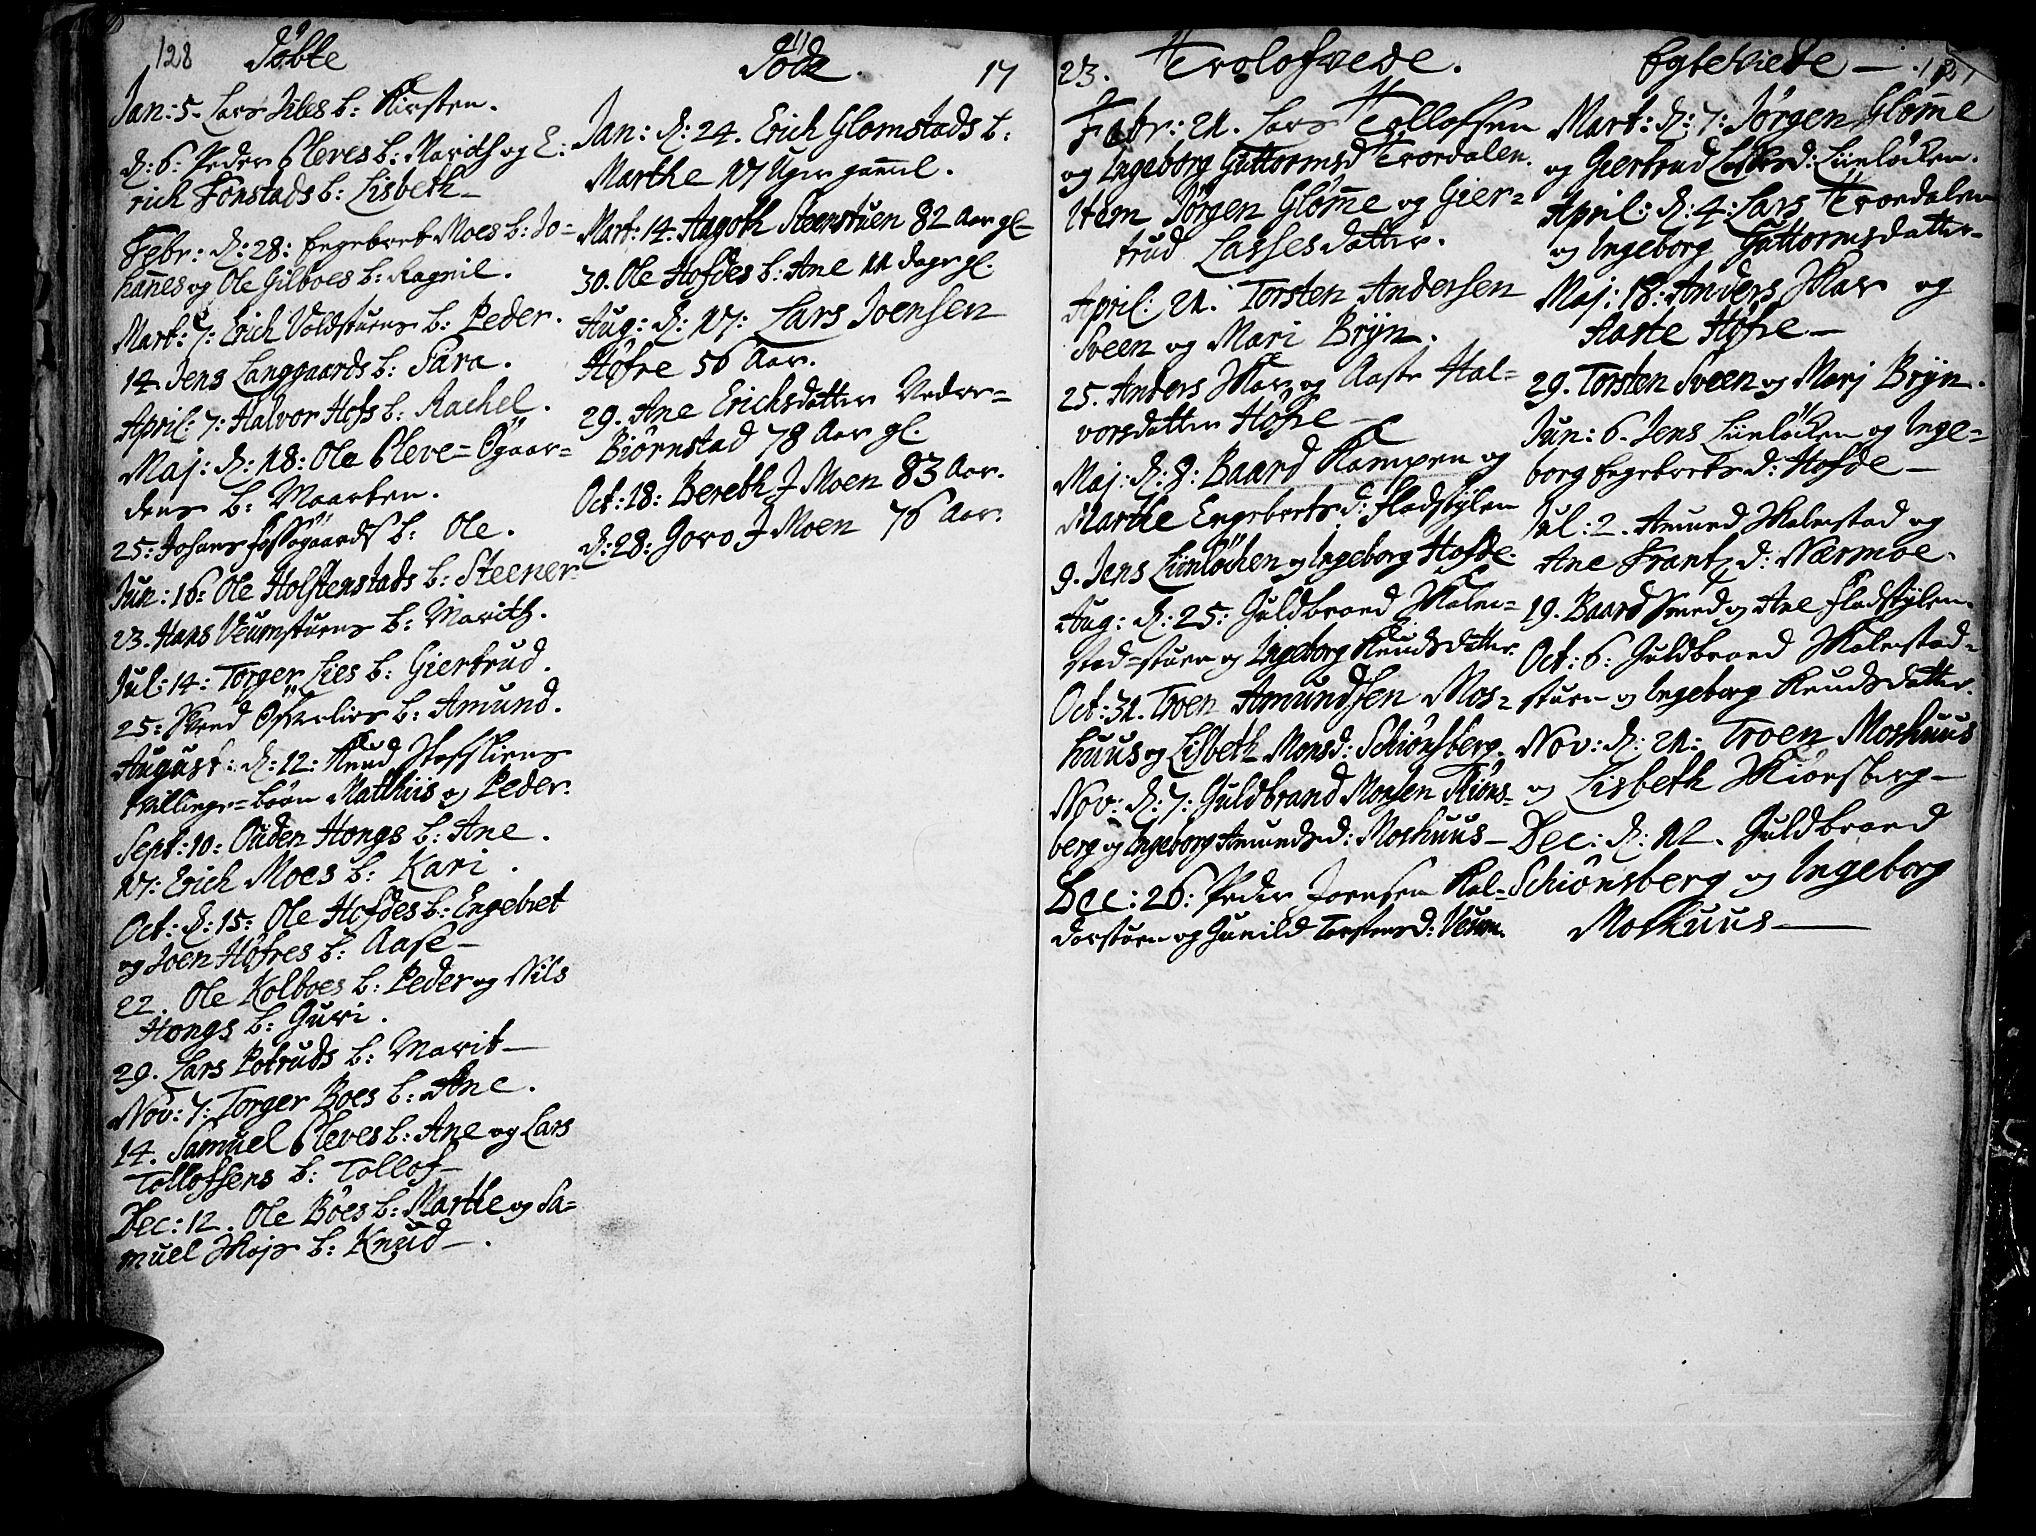 SAH, Øyer prestekontor, Ministerialbok nr. 1, 1671-1727, s. 128-129